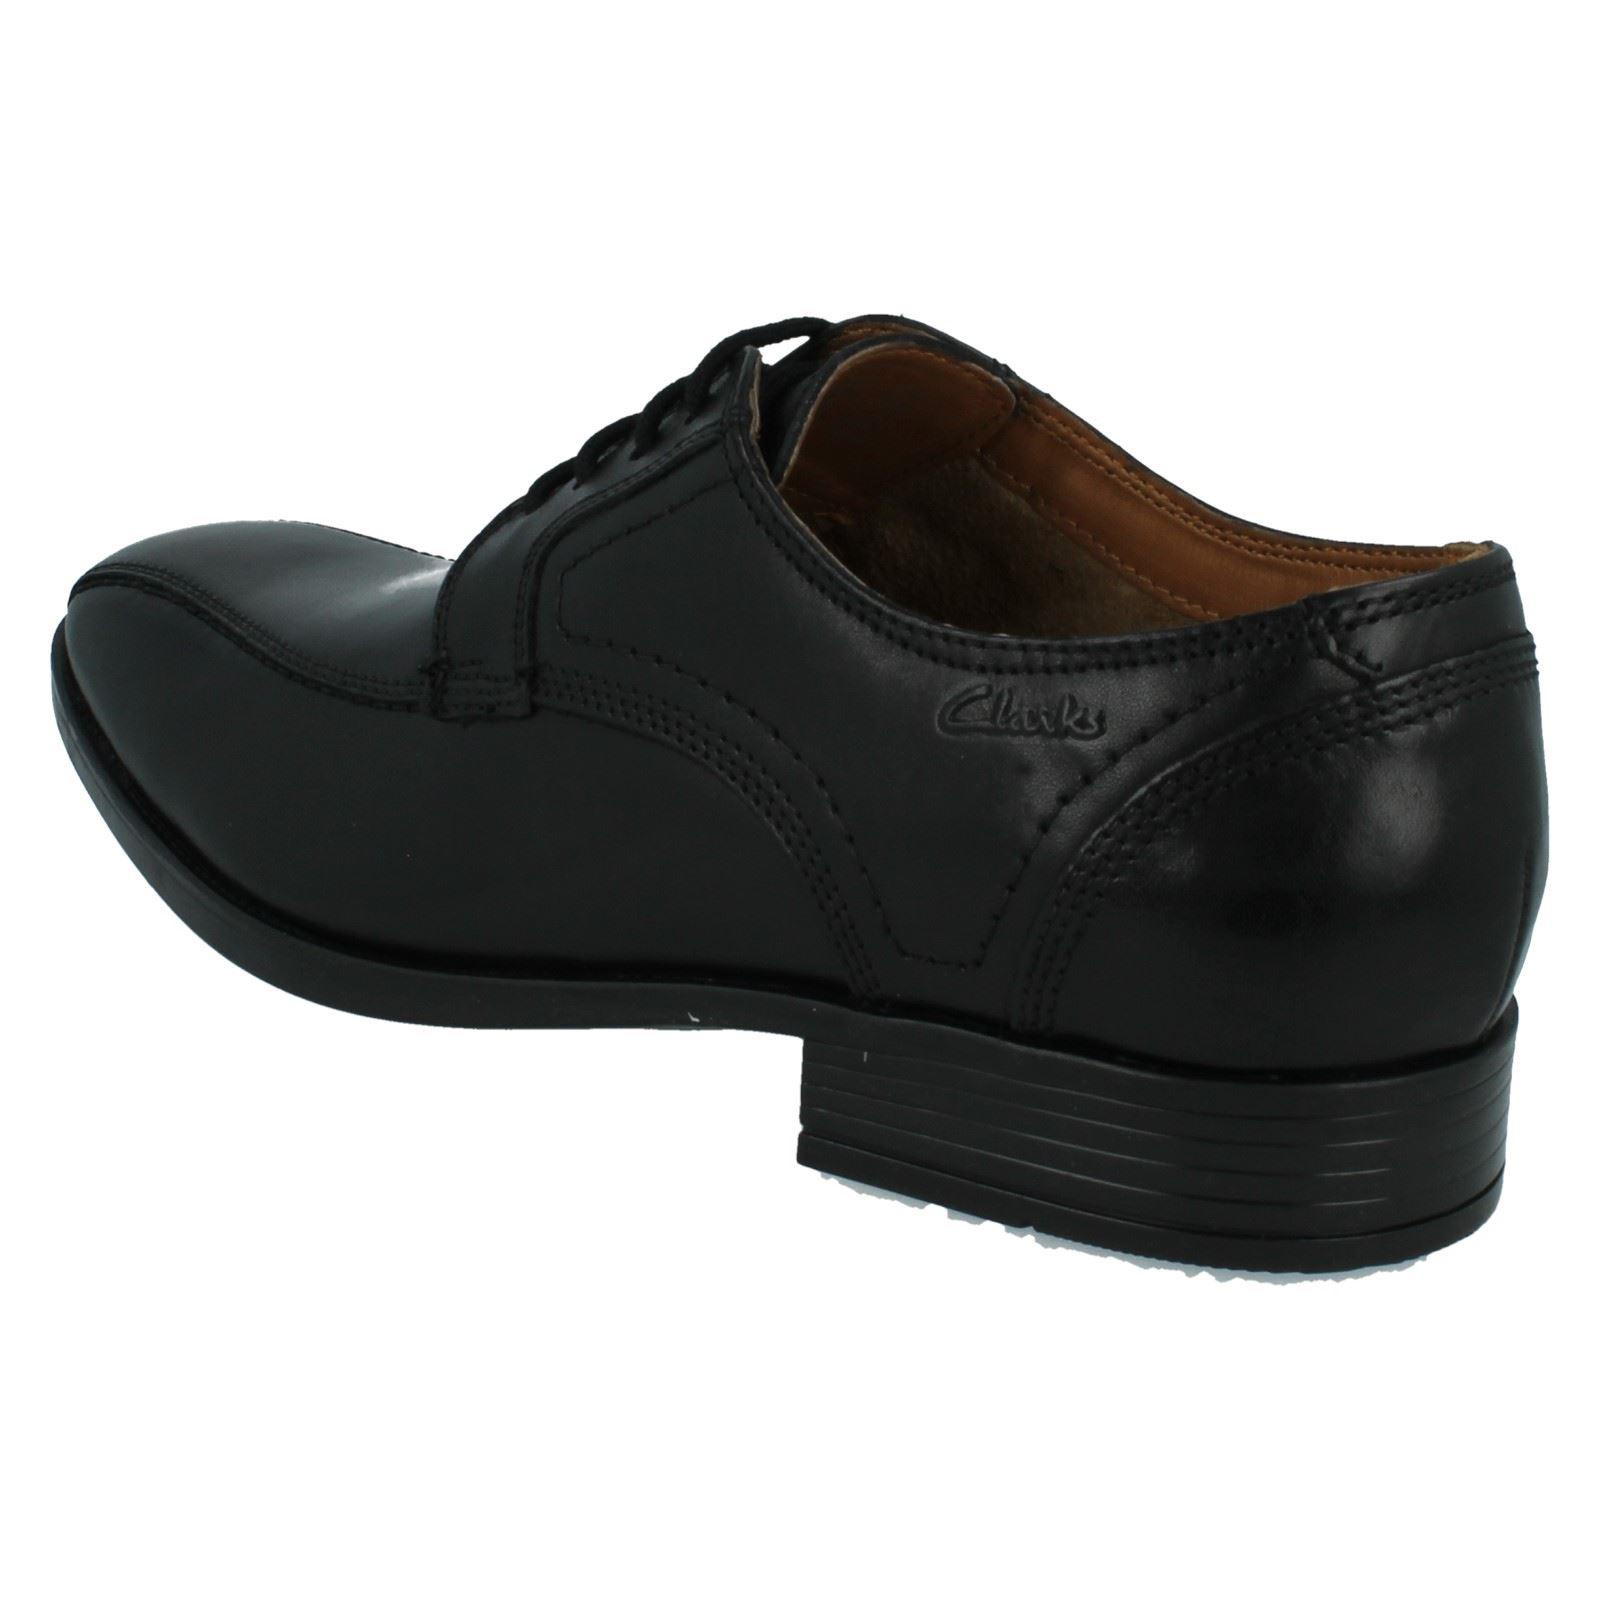 Para Hombre Clarks Clarks Hombre lazada formal Zapatos Estilo-kalden Vibe 58f9c2